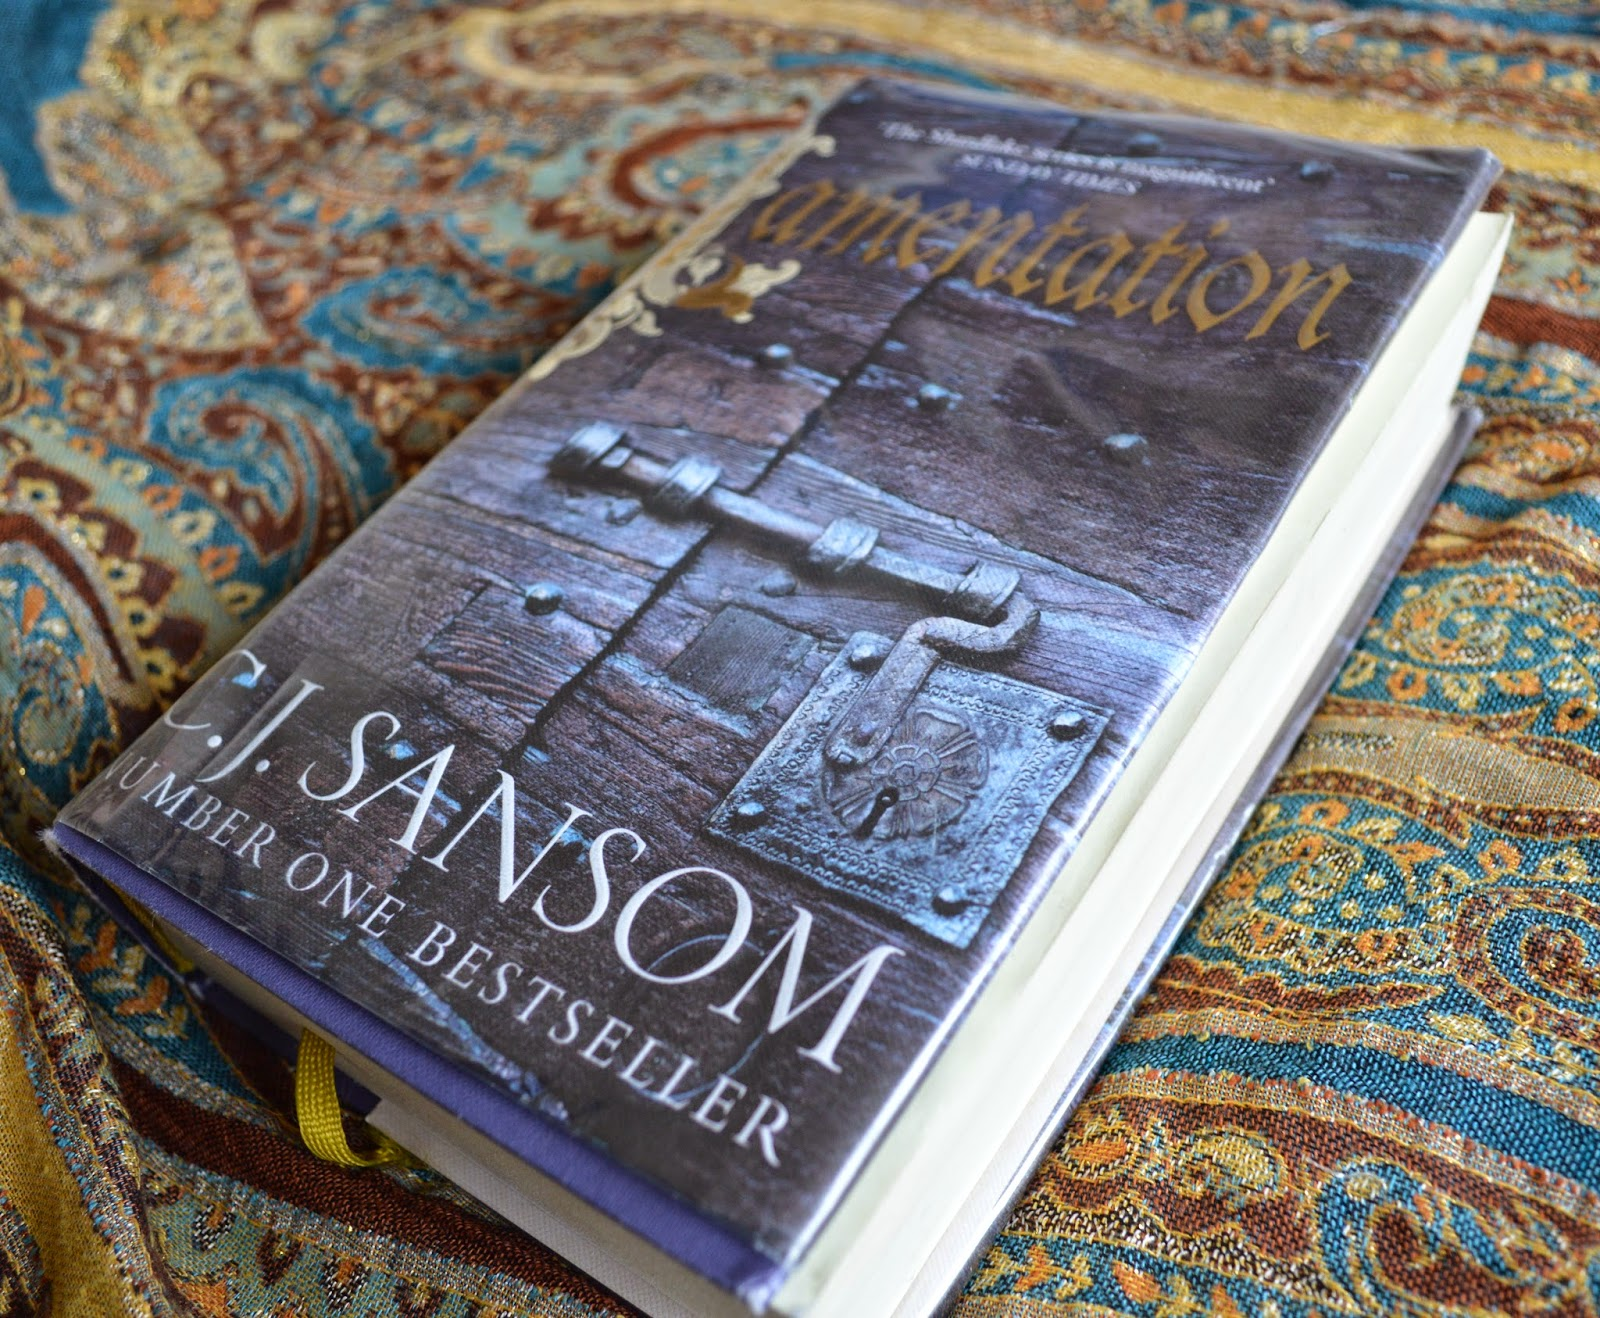 C J Sansom, Lamentation, book review, 6, Shardlake series, Tudor, Historical fiction, book review, hardback, book cover, religious reform, Henry VII, Catherine Parr, mystery, detective,